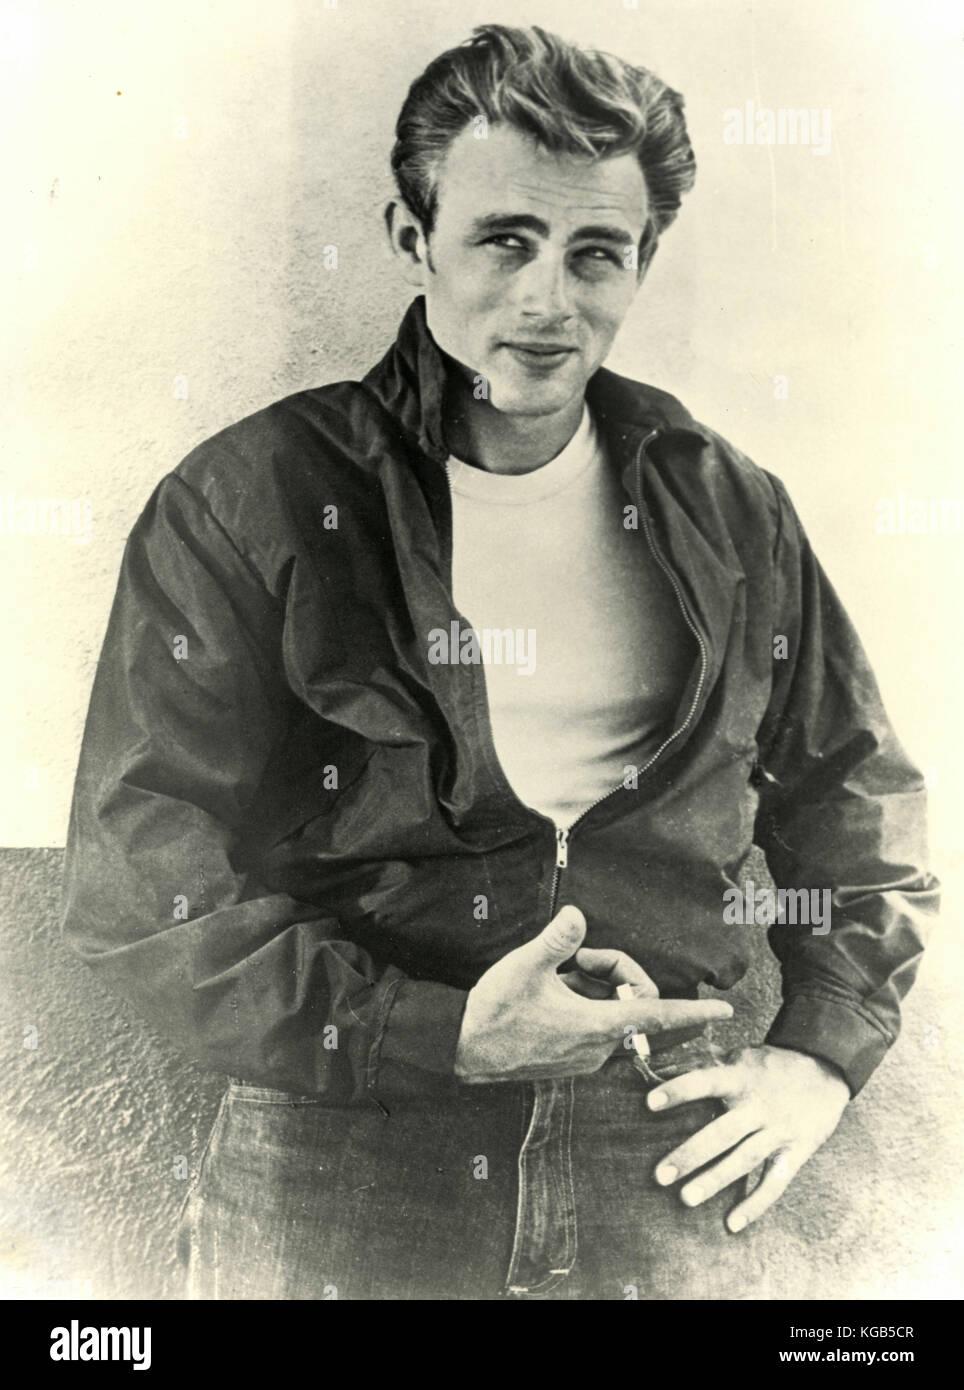 American actor James Dean - Stock Image